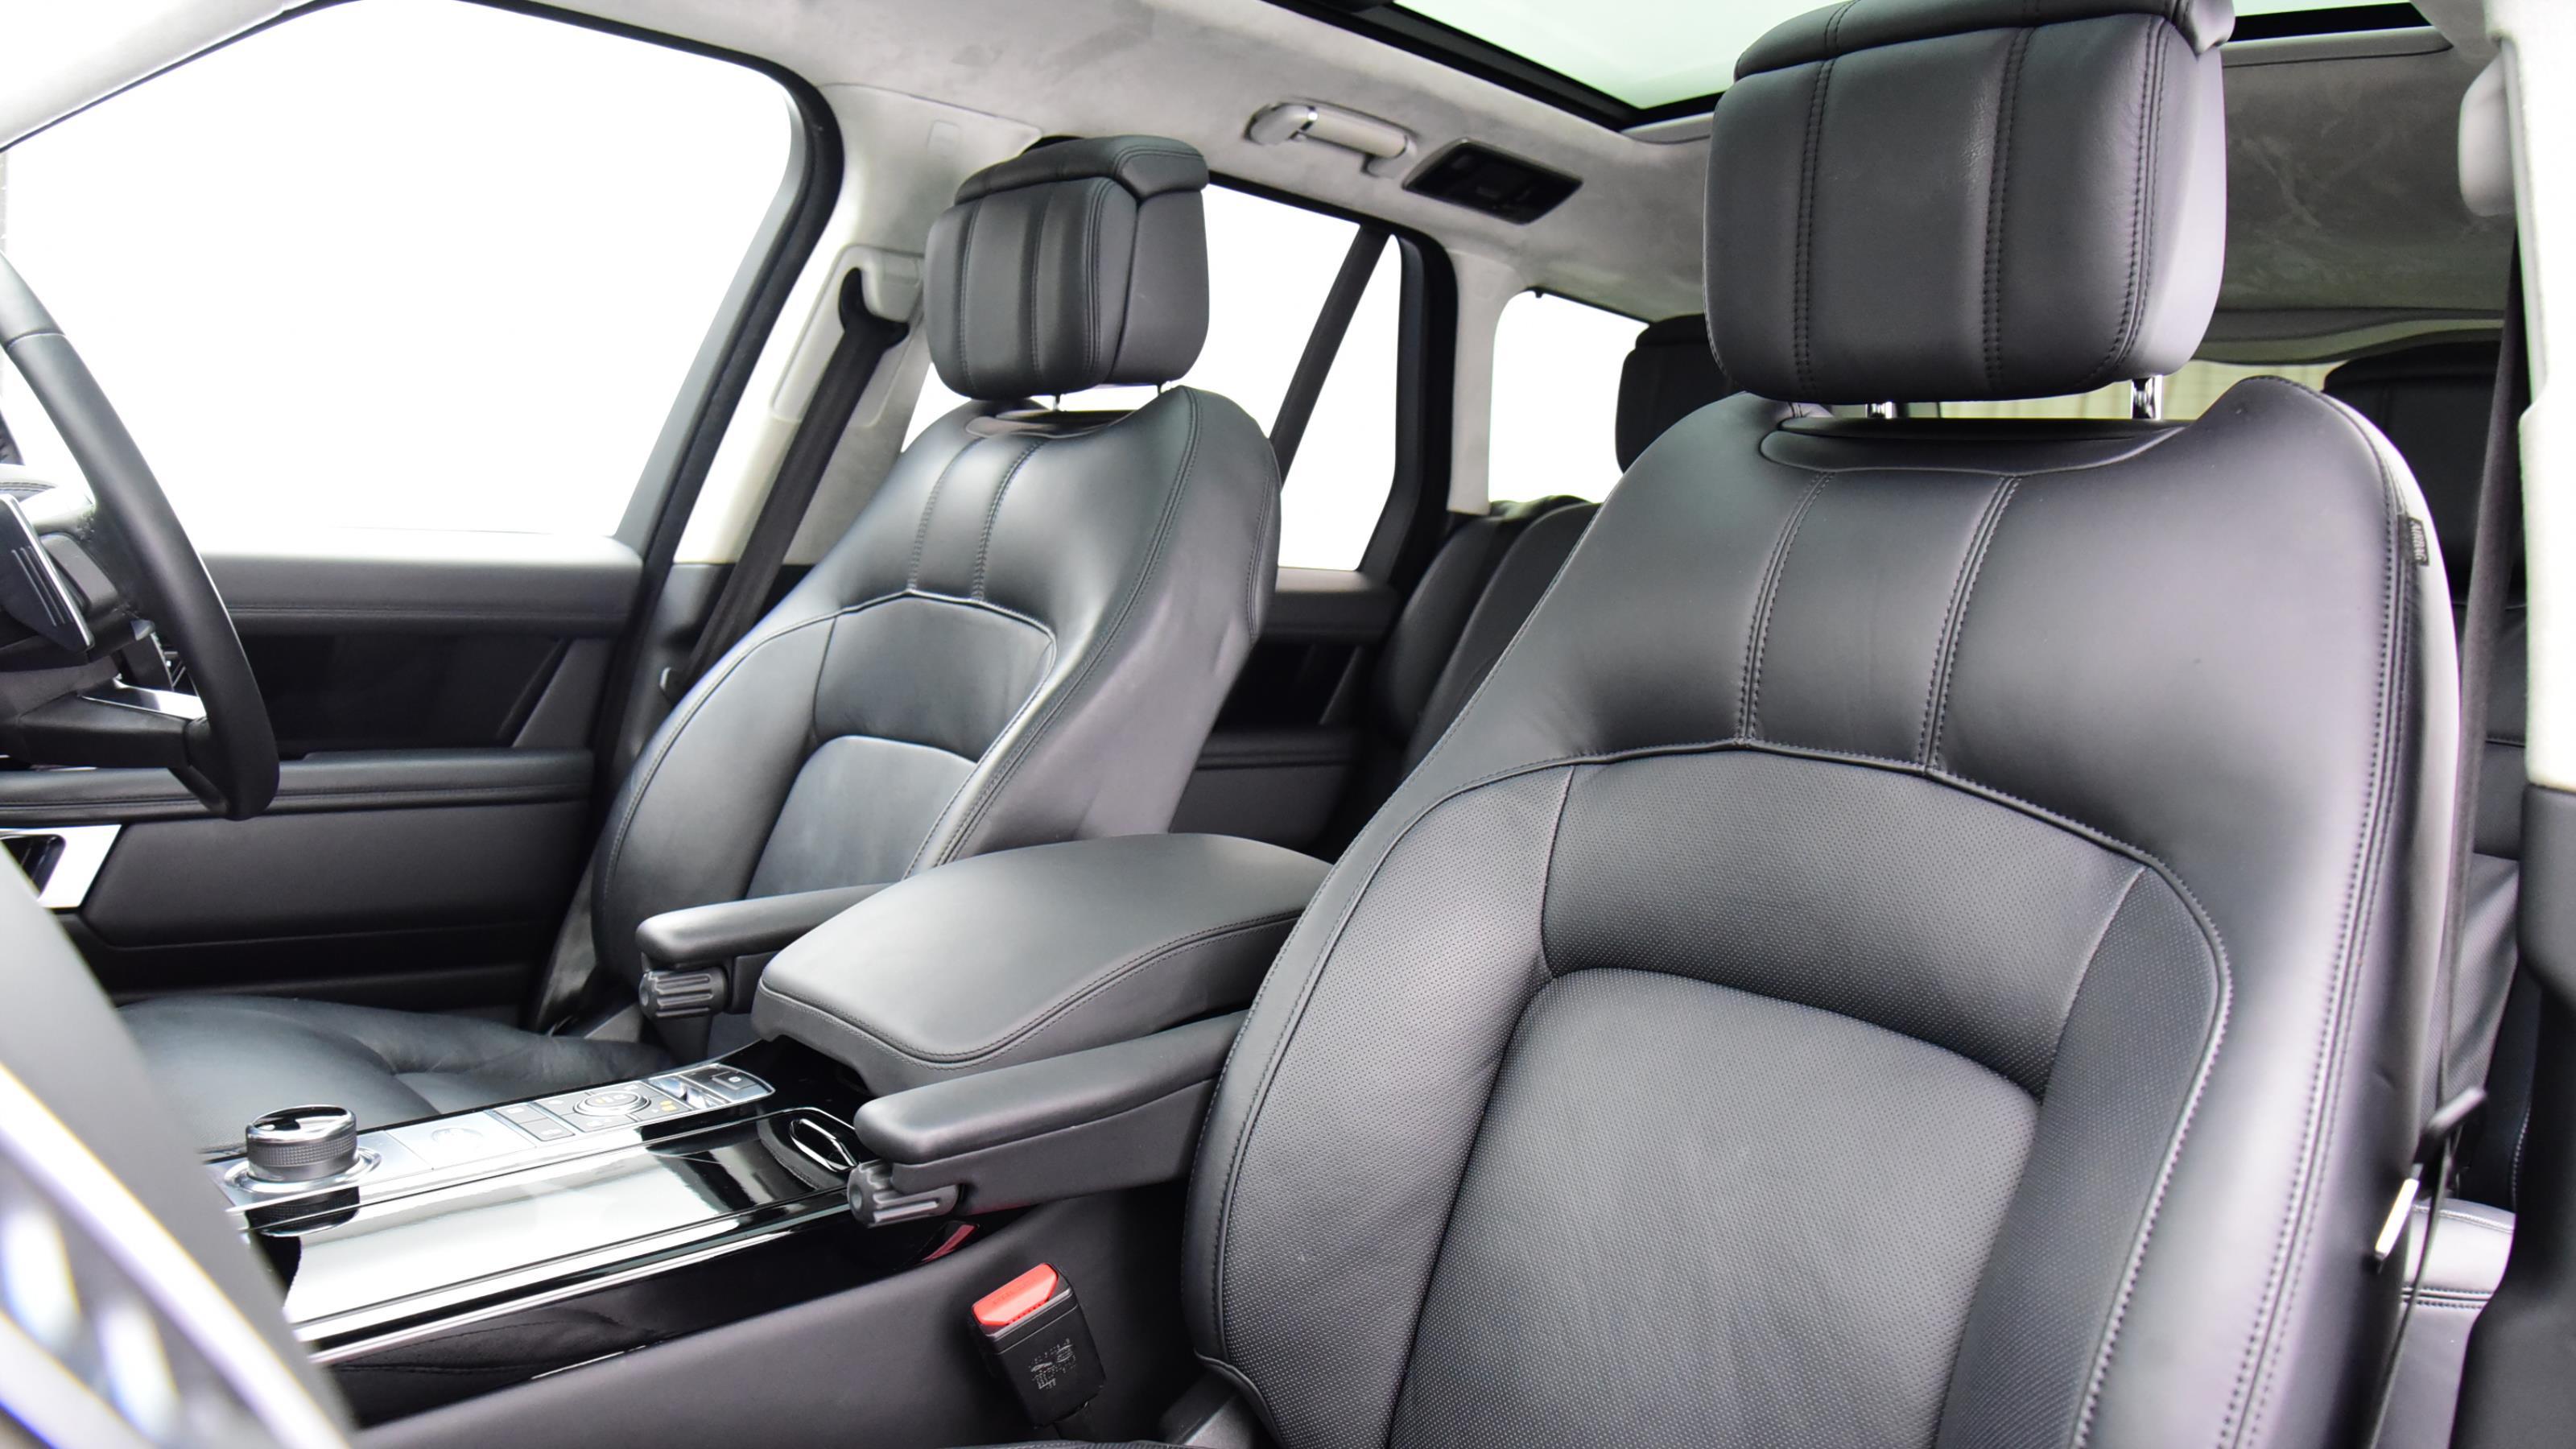 Used 2019 Land Rover RANGE ROVER 2.0 P400e Autobiography 4dr Auto GREY at Saxton4x4